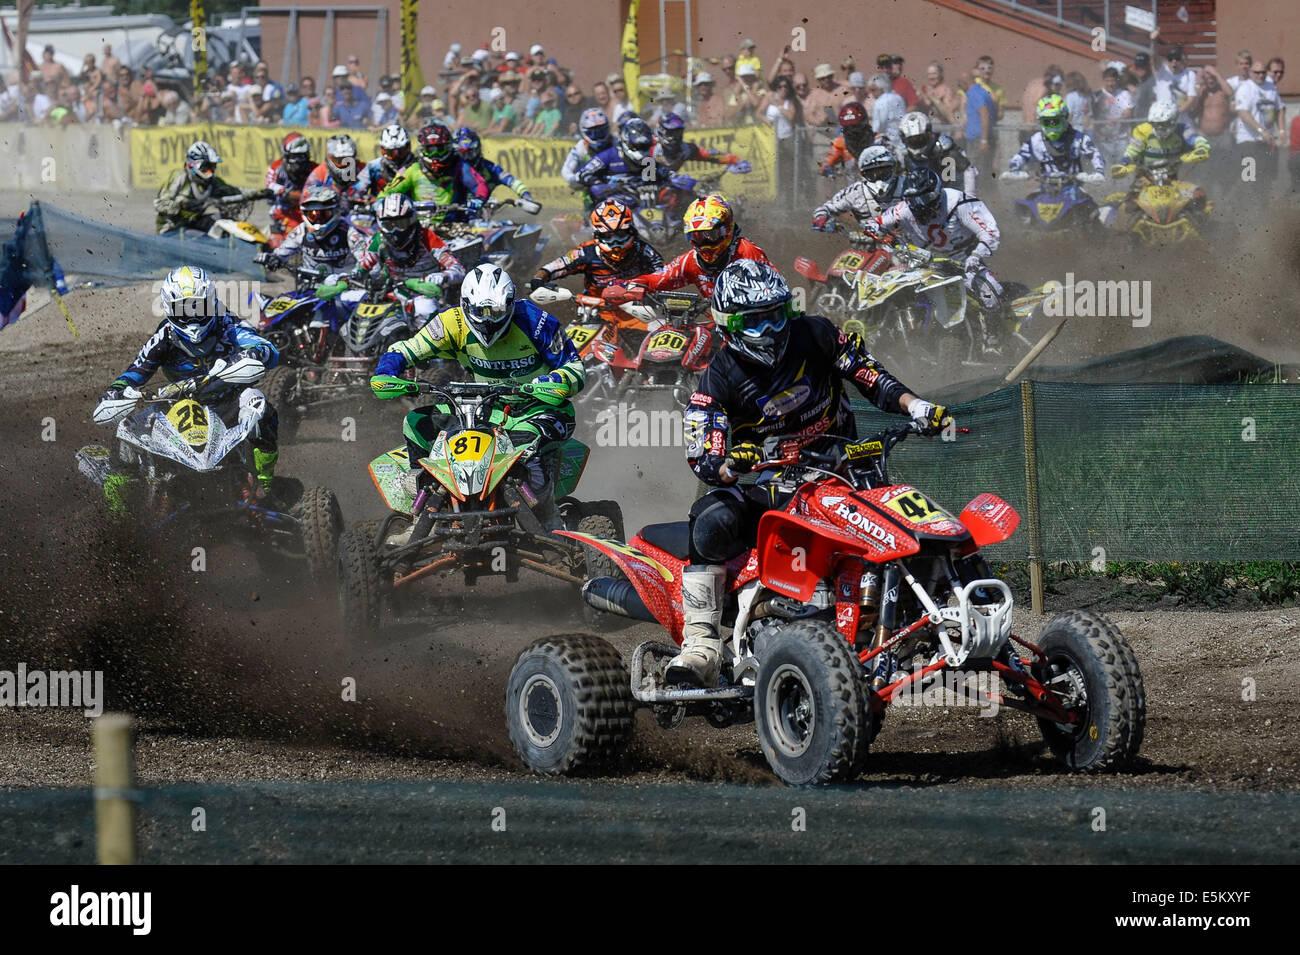 Kivioli. 3rd Aug, 2014. Riders compete during the MAXXIS Quadcross European Championship held in Kivioli, Estonia - Stock Image